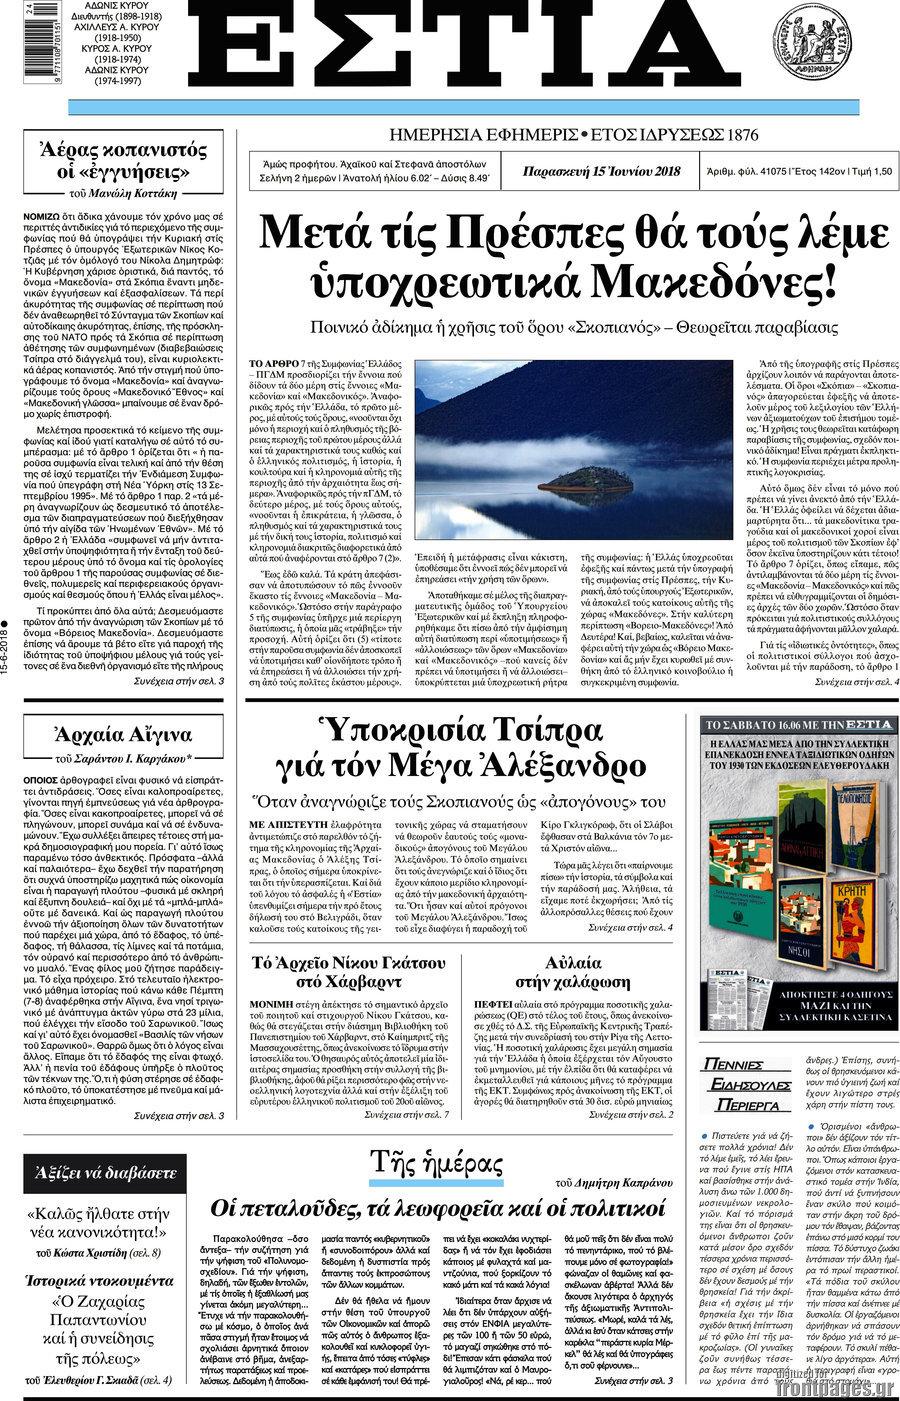 https://www.frontpages.gr/data/2018/20180615/EstiaI.jpg